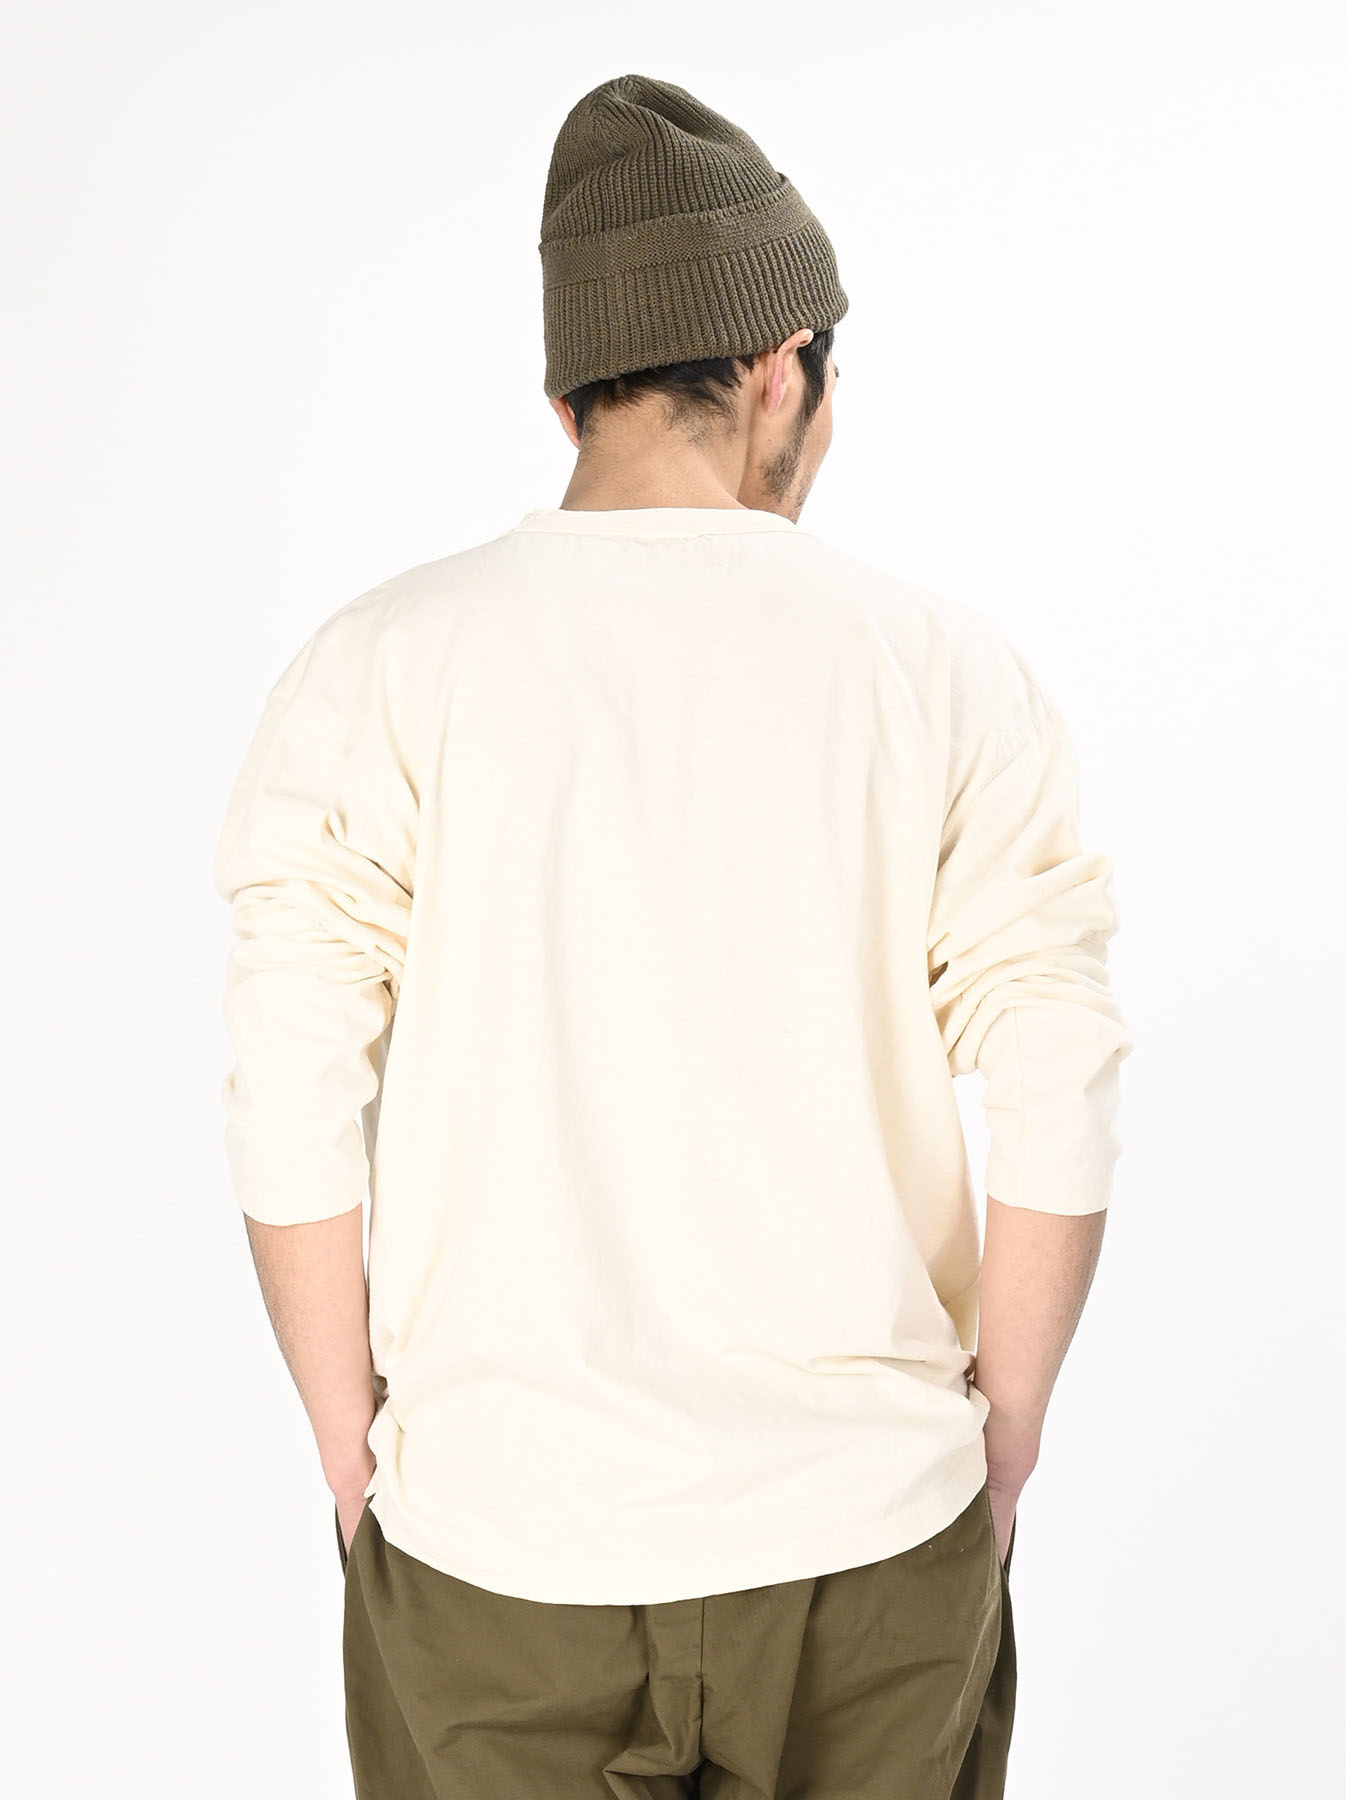 Zimbabwe Cotton 908 Ocean Long-sleeved T-shirt-6